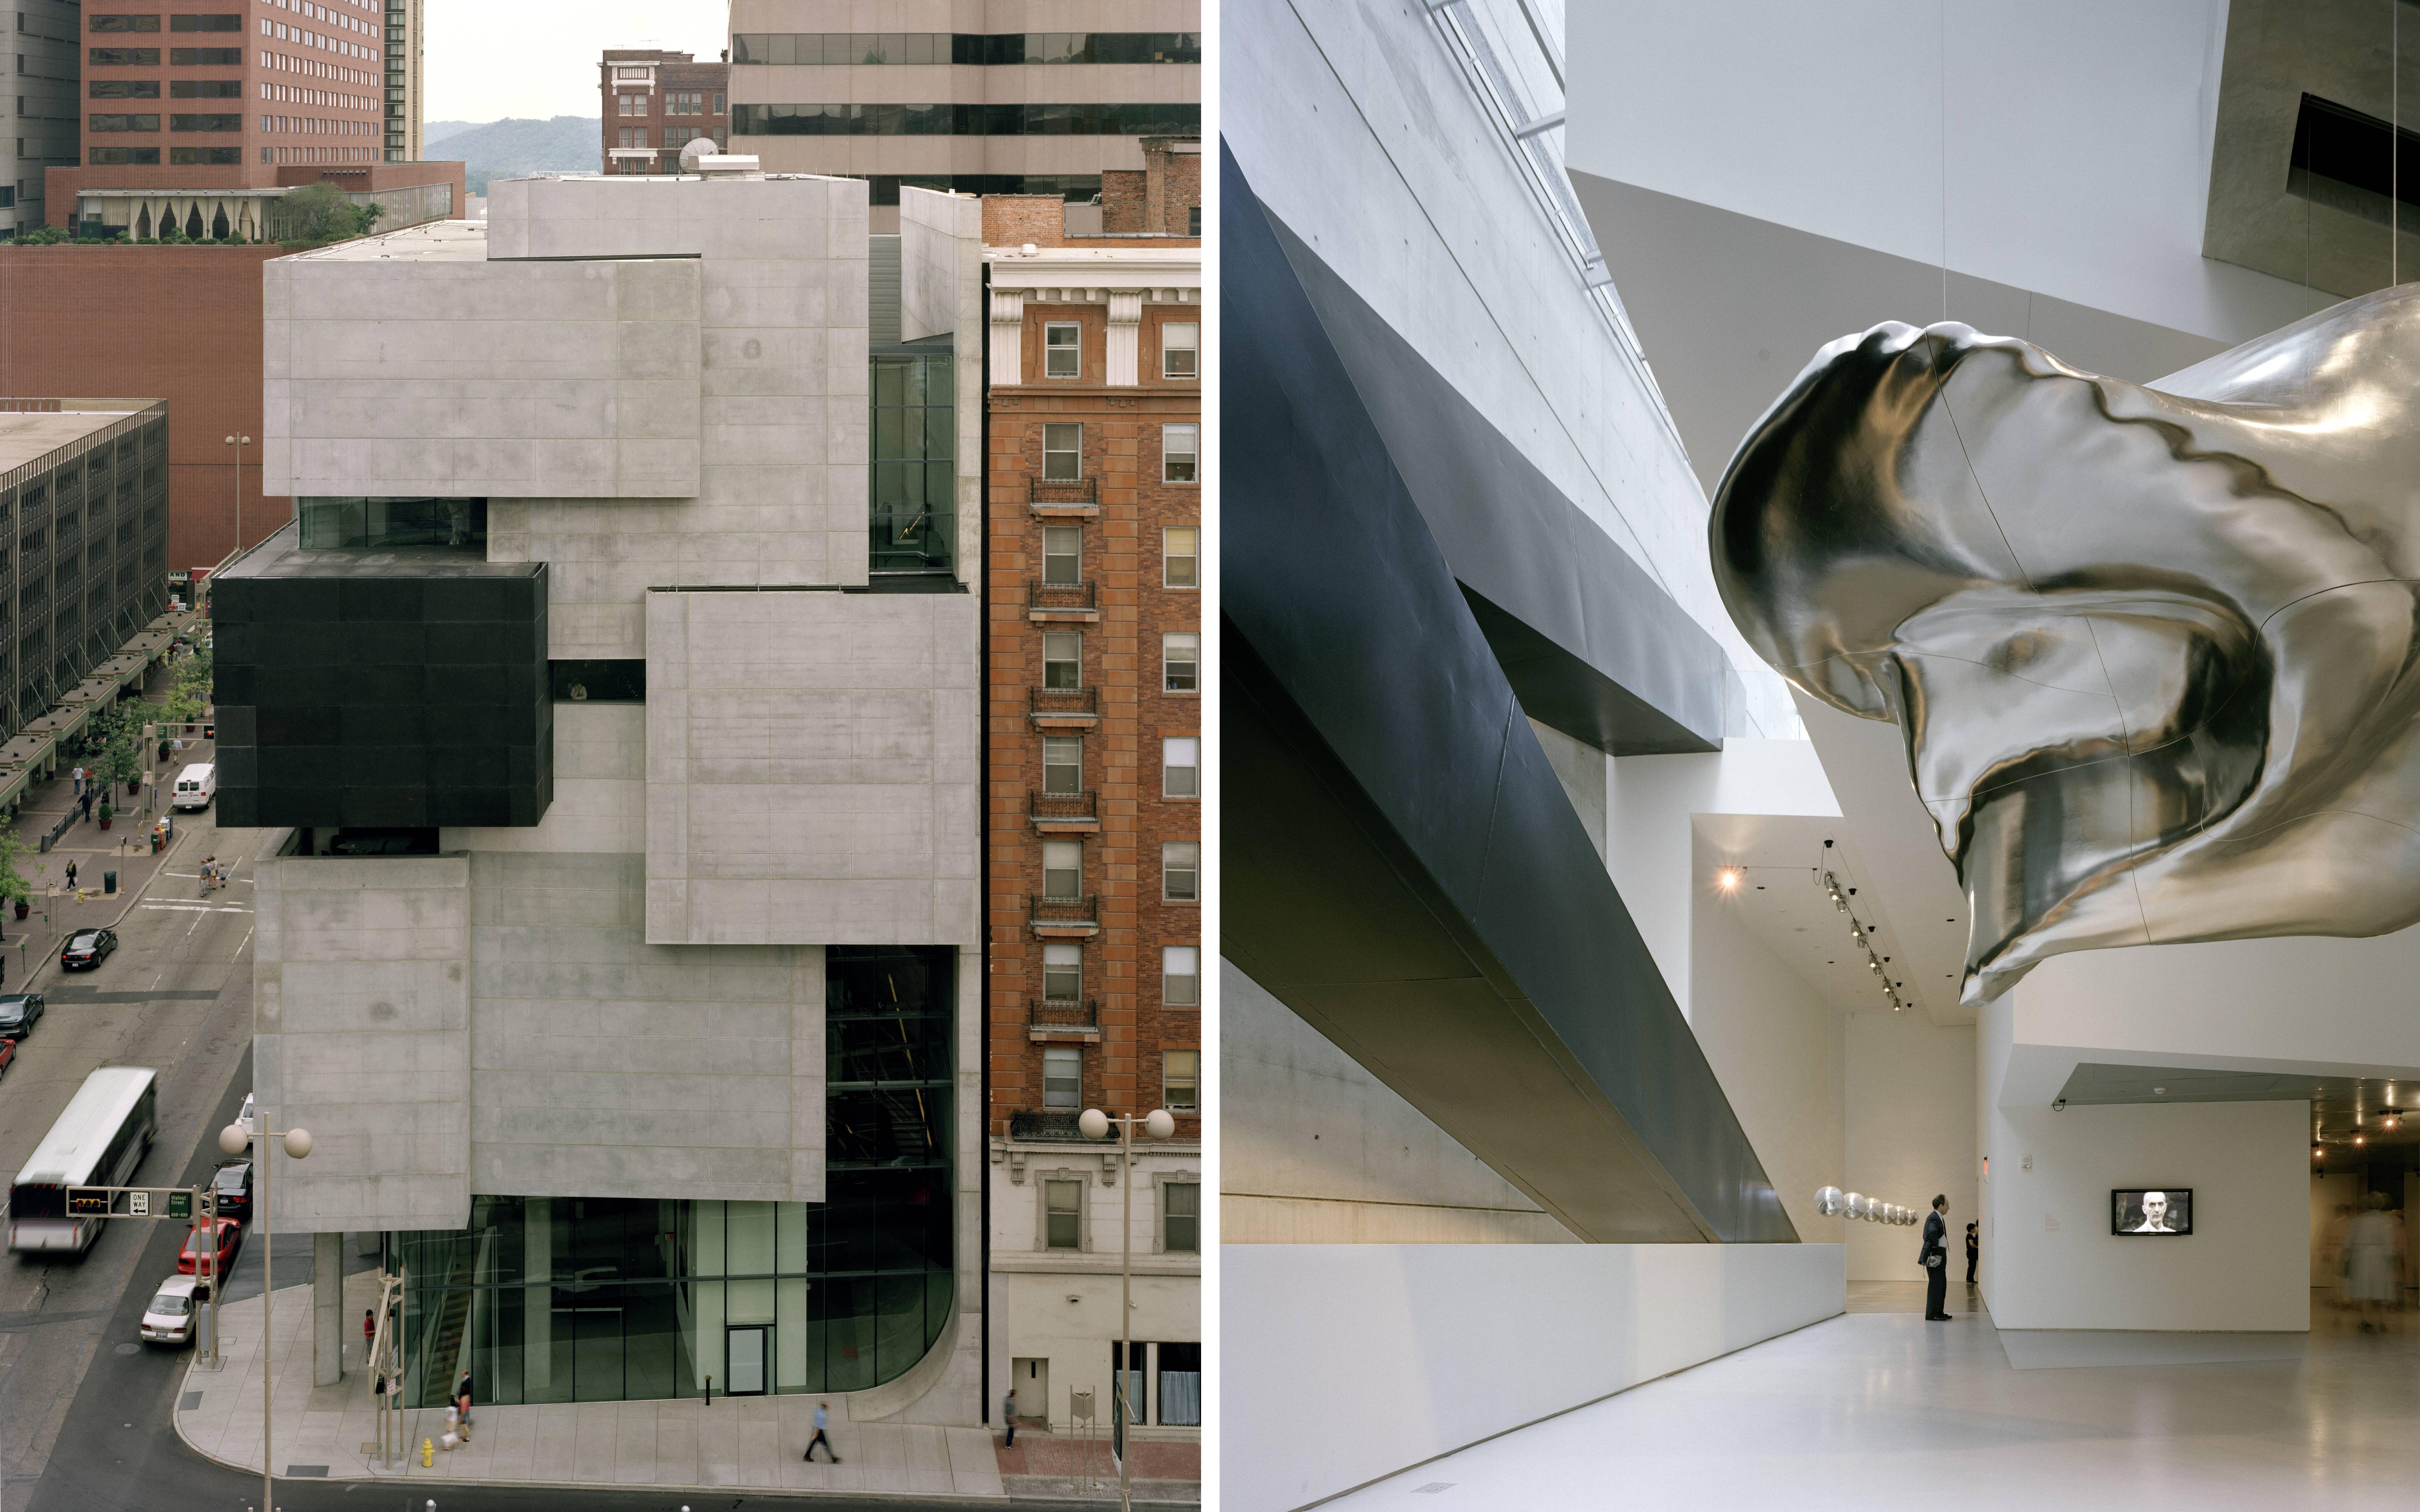 The Rosenthal Center for Contemporary Arts in Cincinnati, Ohio